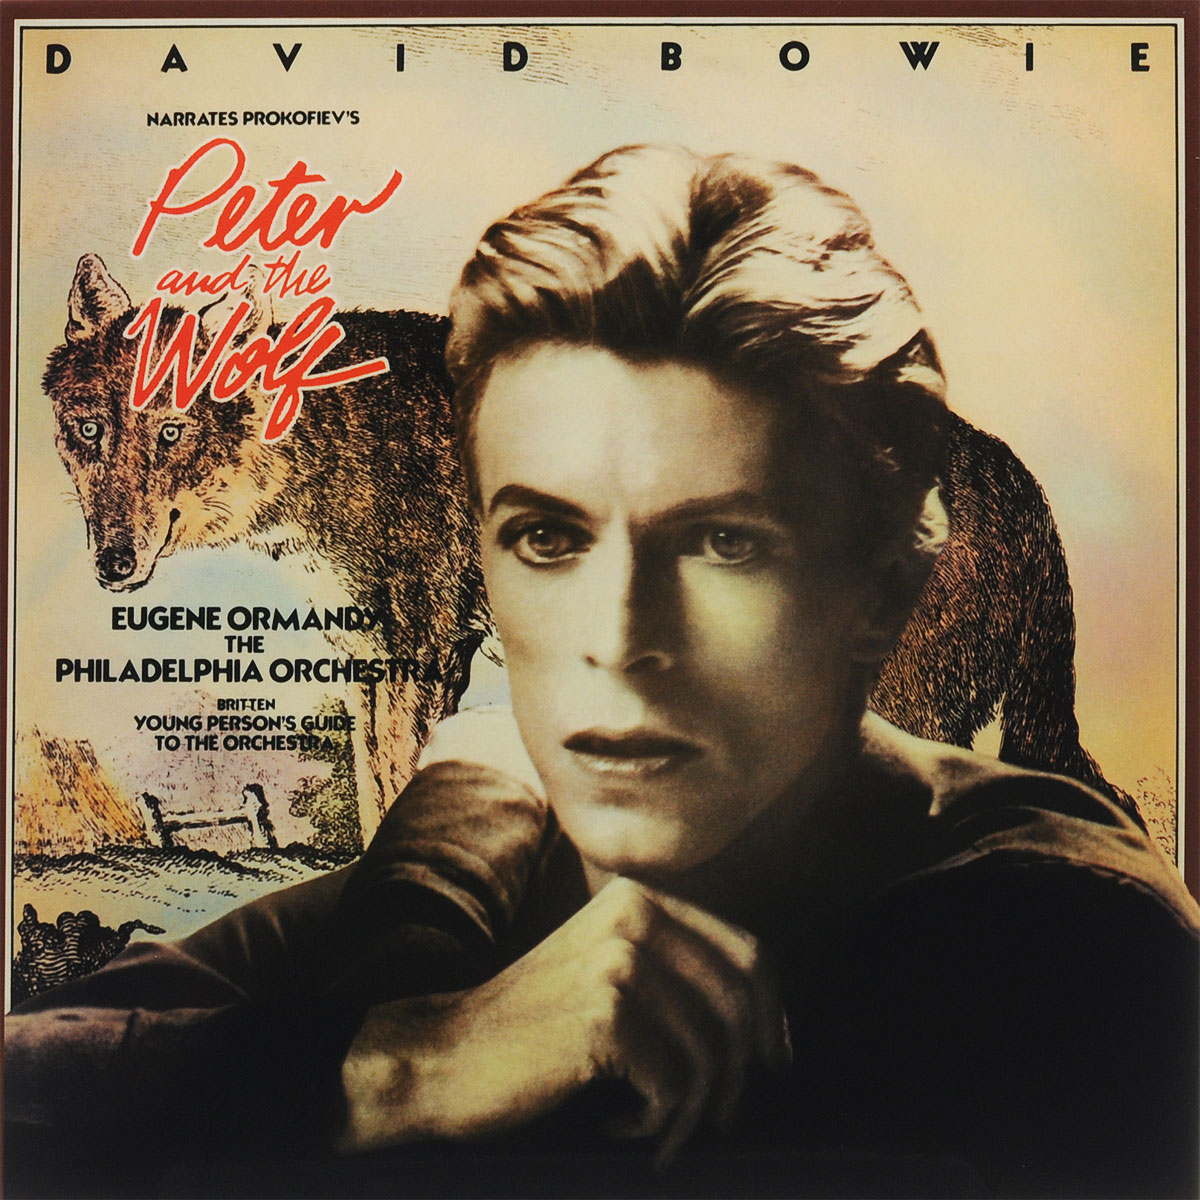 Дэвид Боуи,The Philadelphia Orchestra,Юджин Орманди David Bowie. Peter And The Wolf (LP) сайдинг vinyl on j профиль 3660 мм кремовый